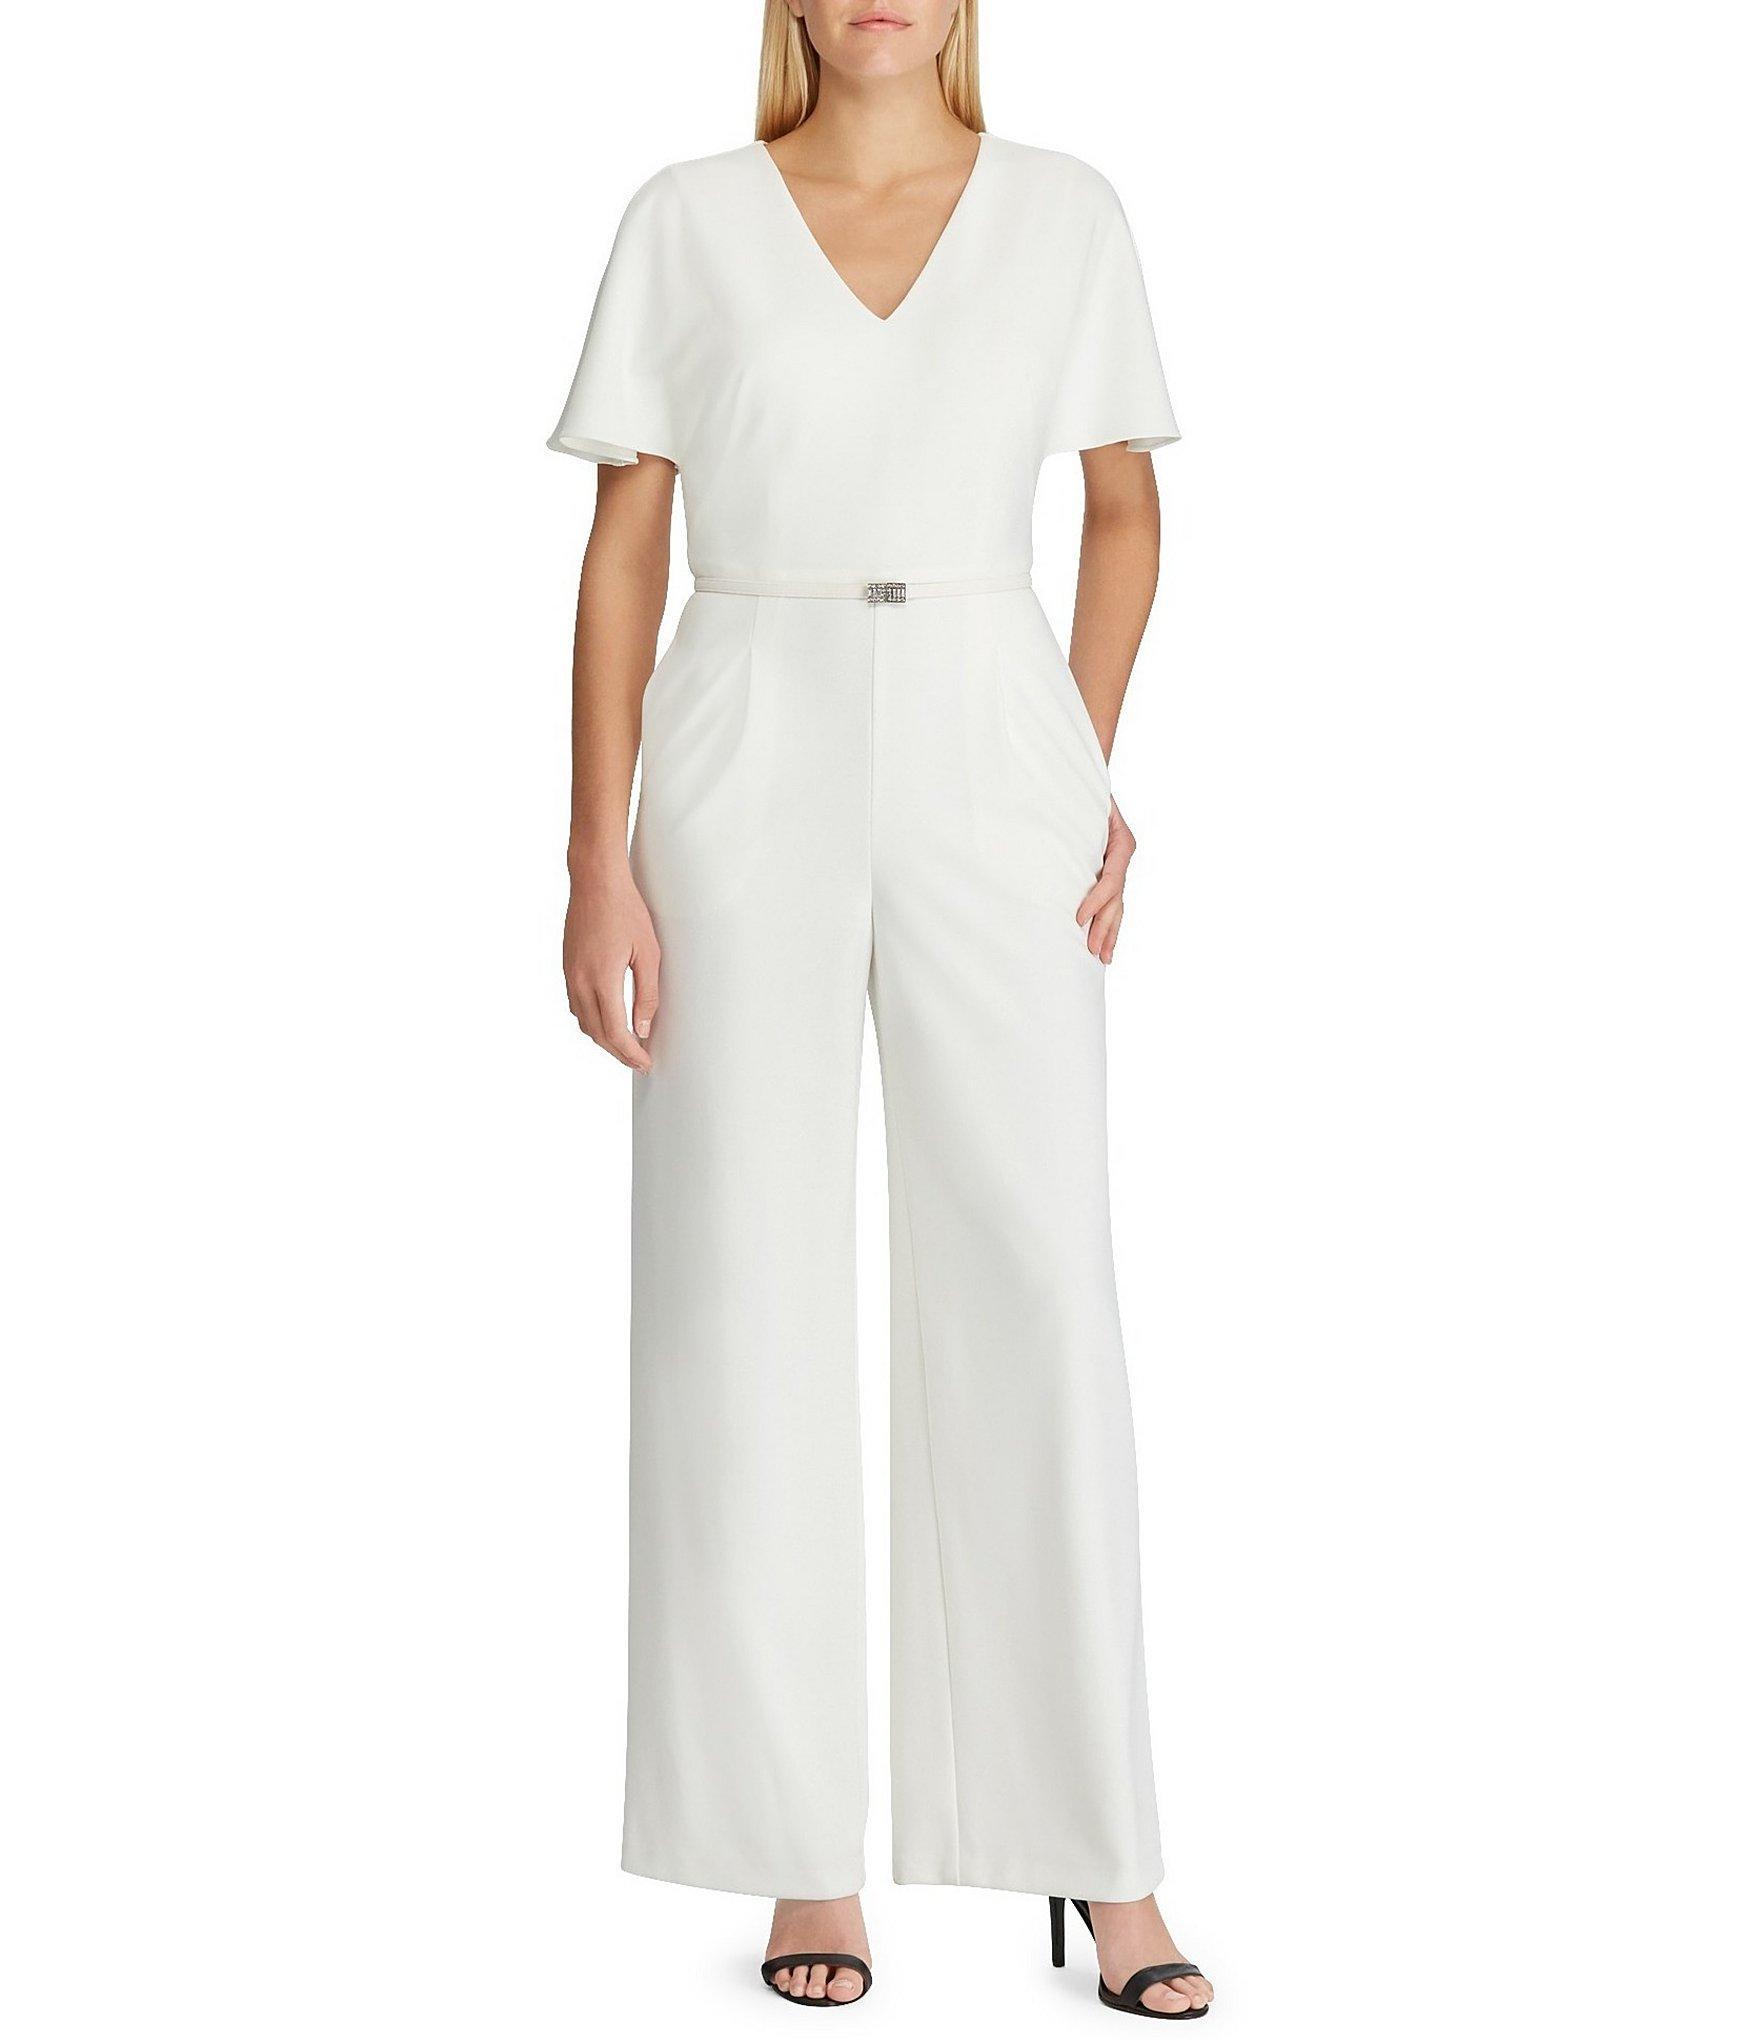 43cf71008a0 Lyst - Lauren by Ralph Lauren Crepe Wide Leg Belted Jumpsuit in White